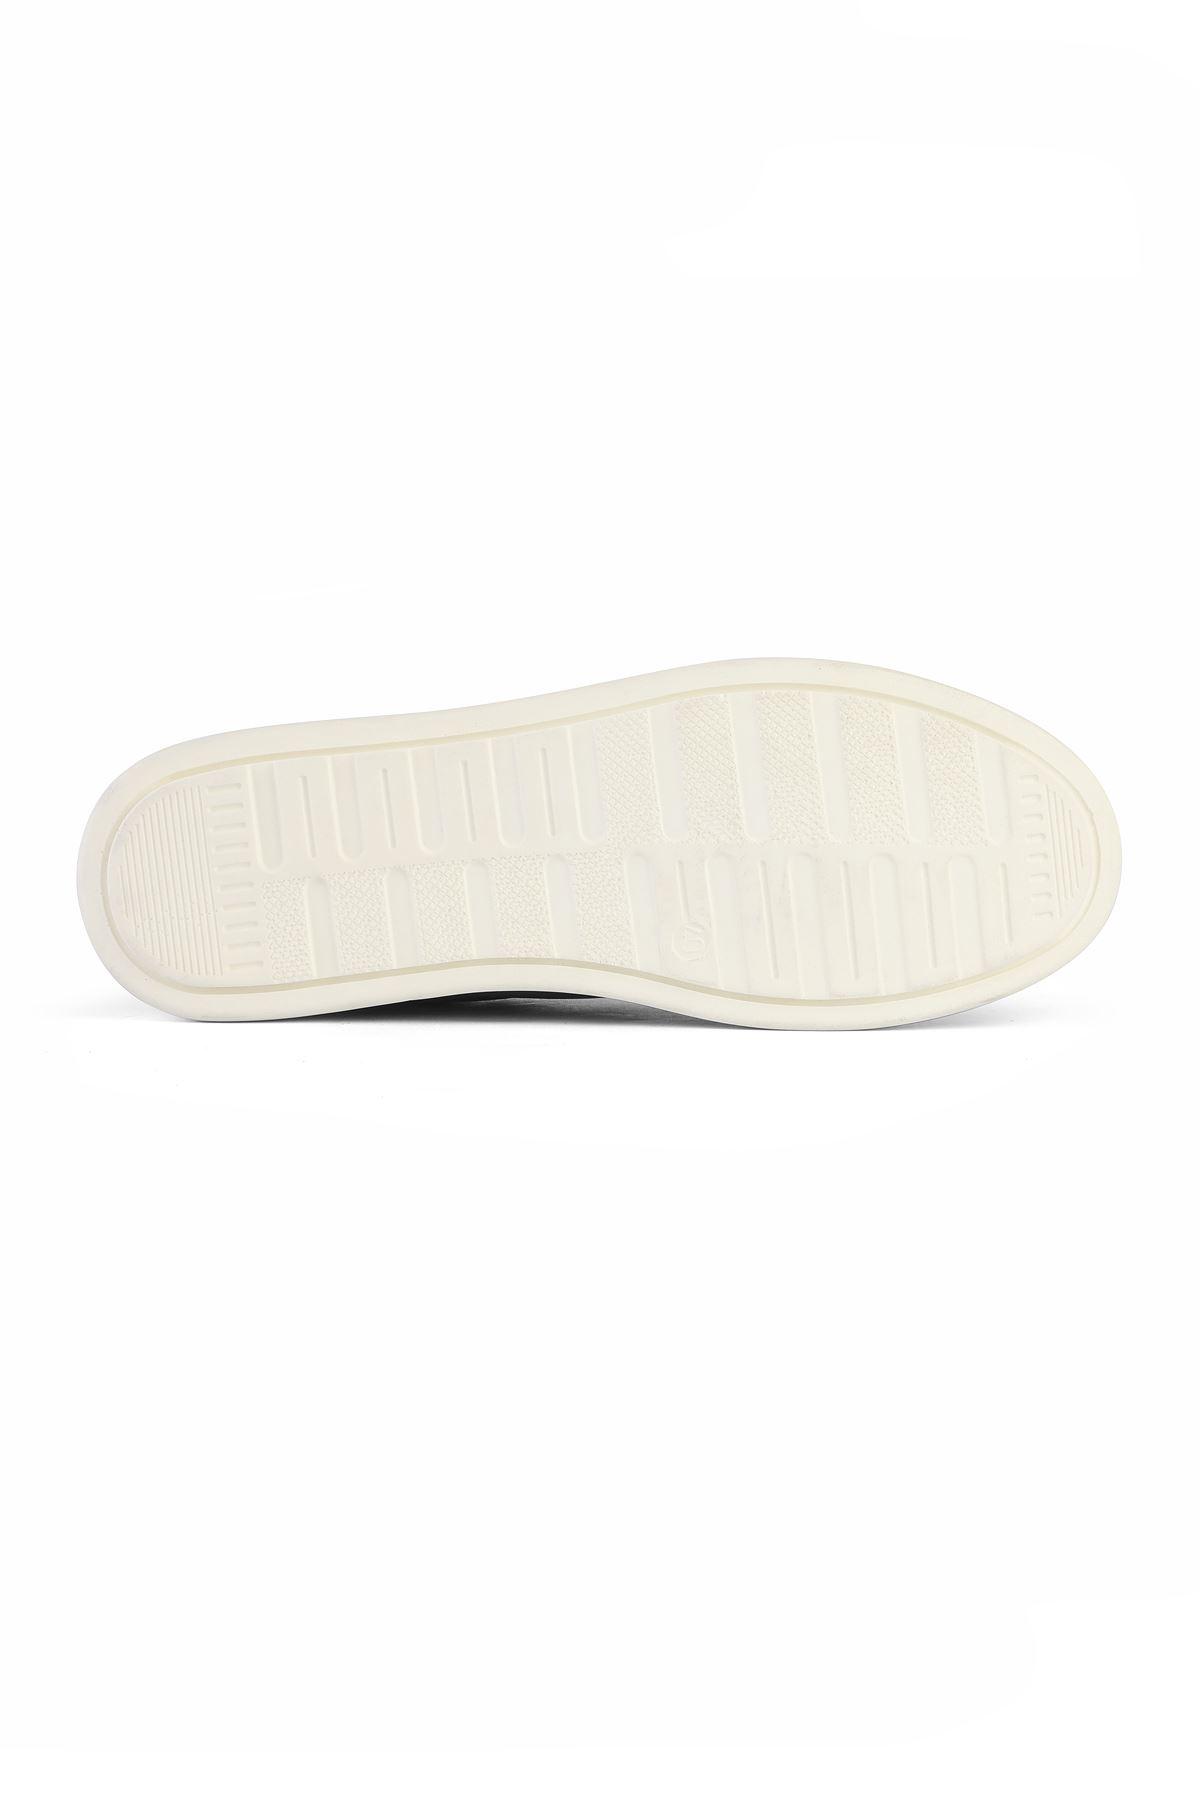 Libero 3308 Navy Blue Casual Shoes